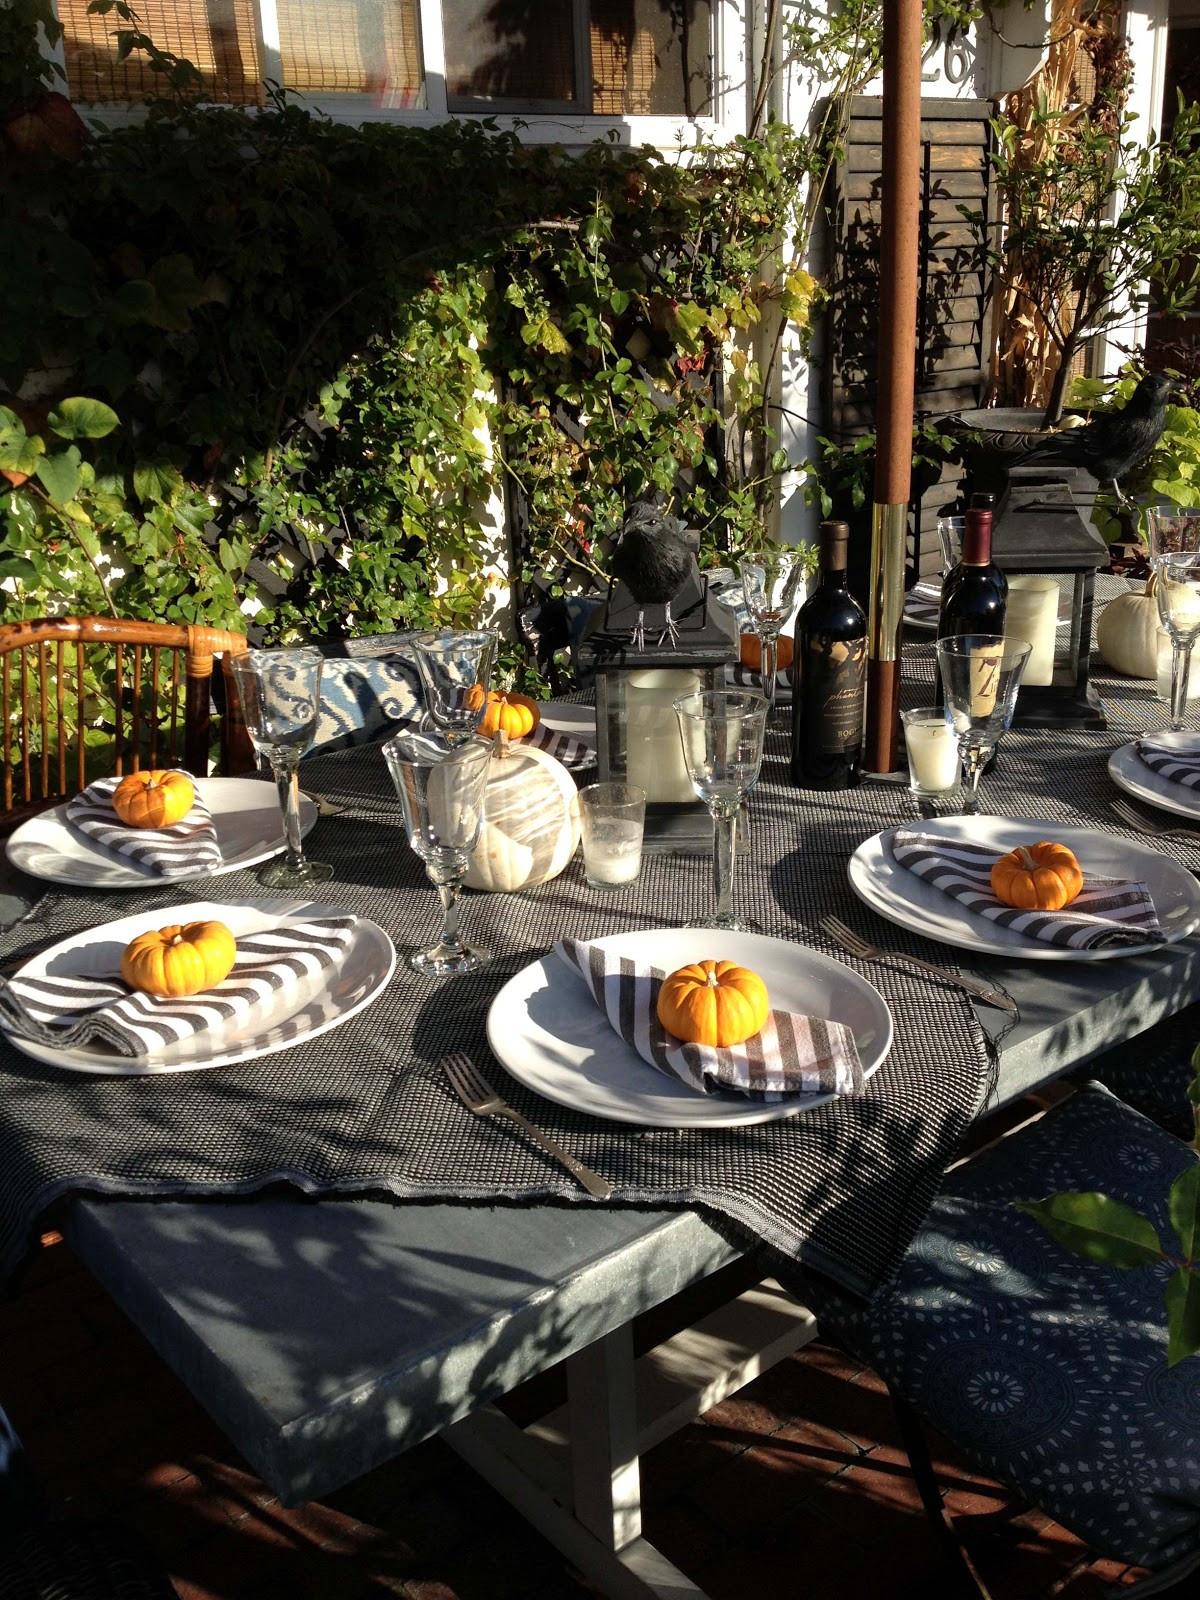 Halloween Dinner Party  The Willows Home & Garden halloween dinner party